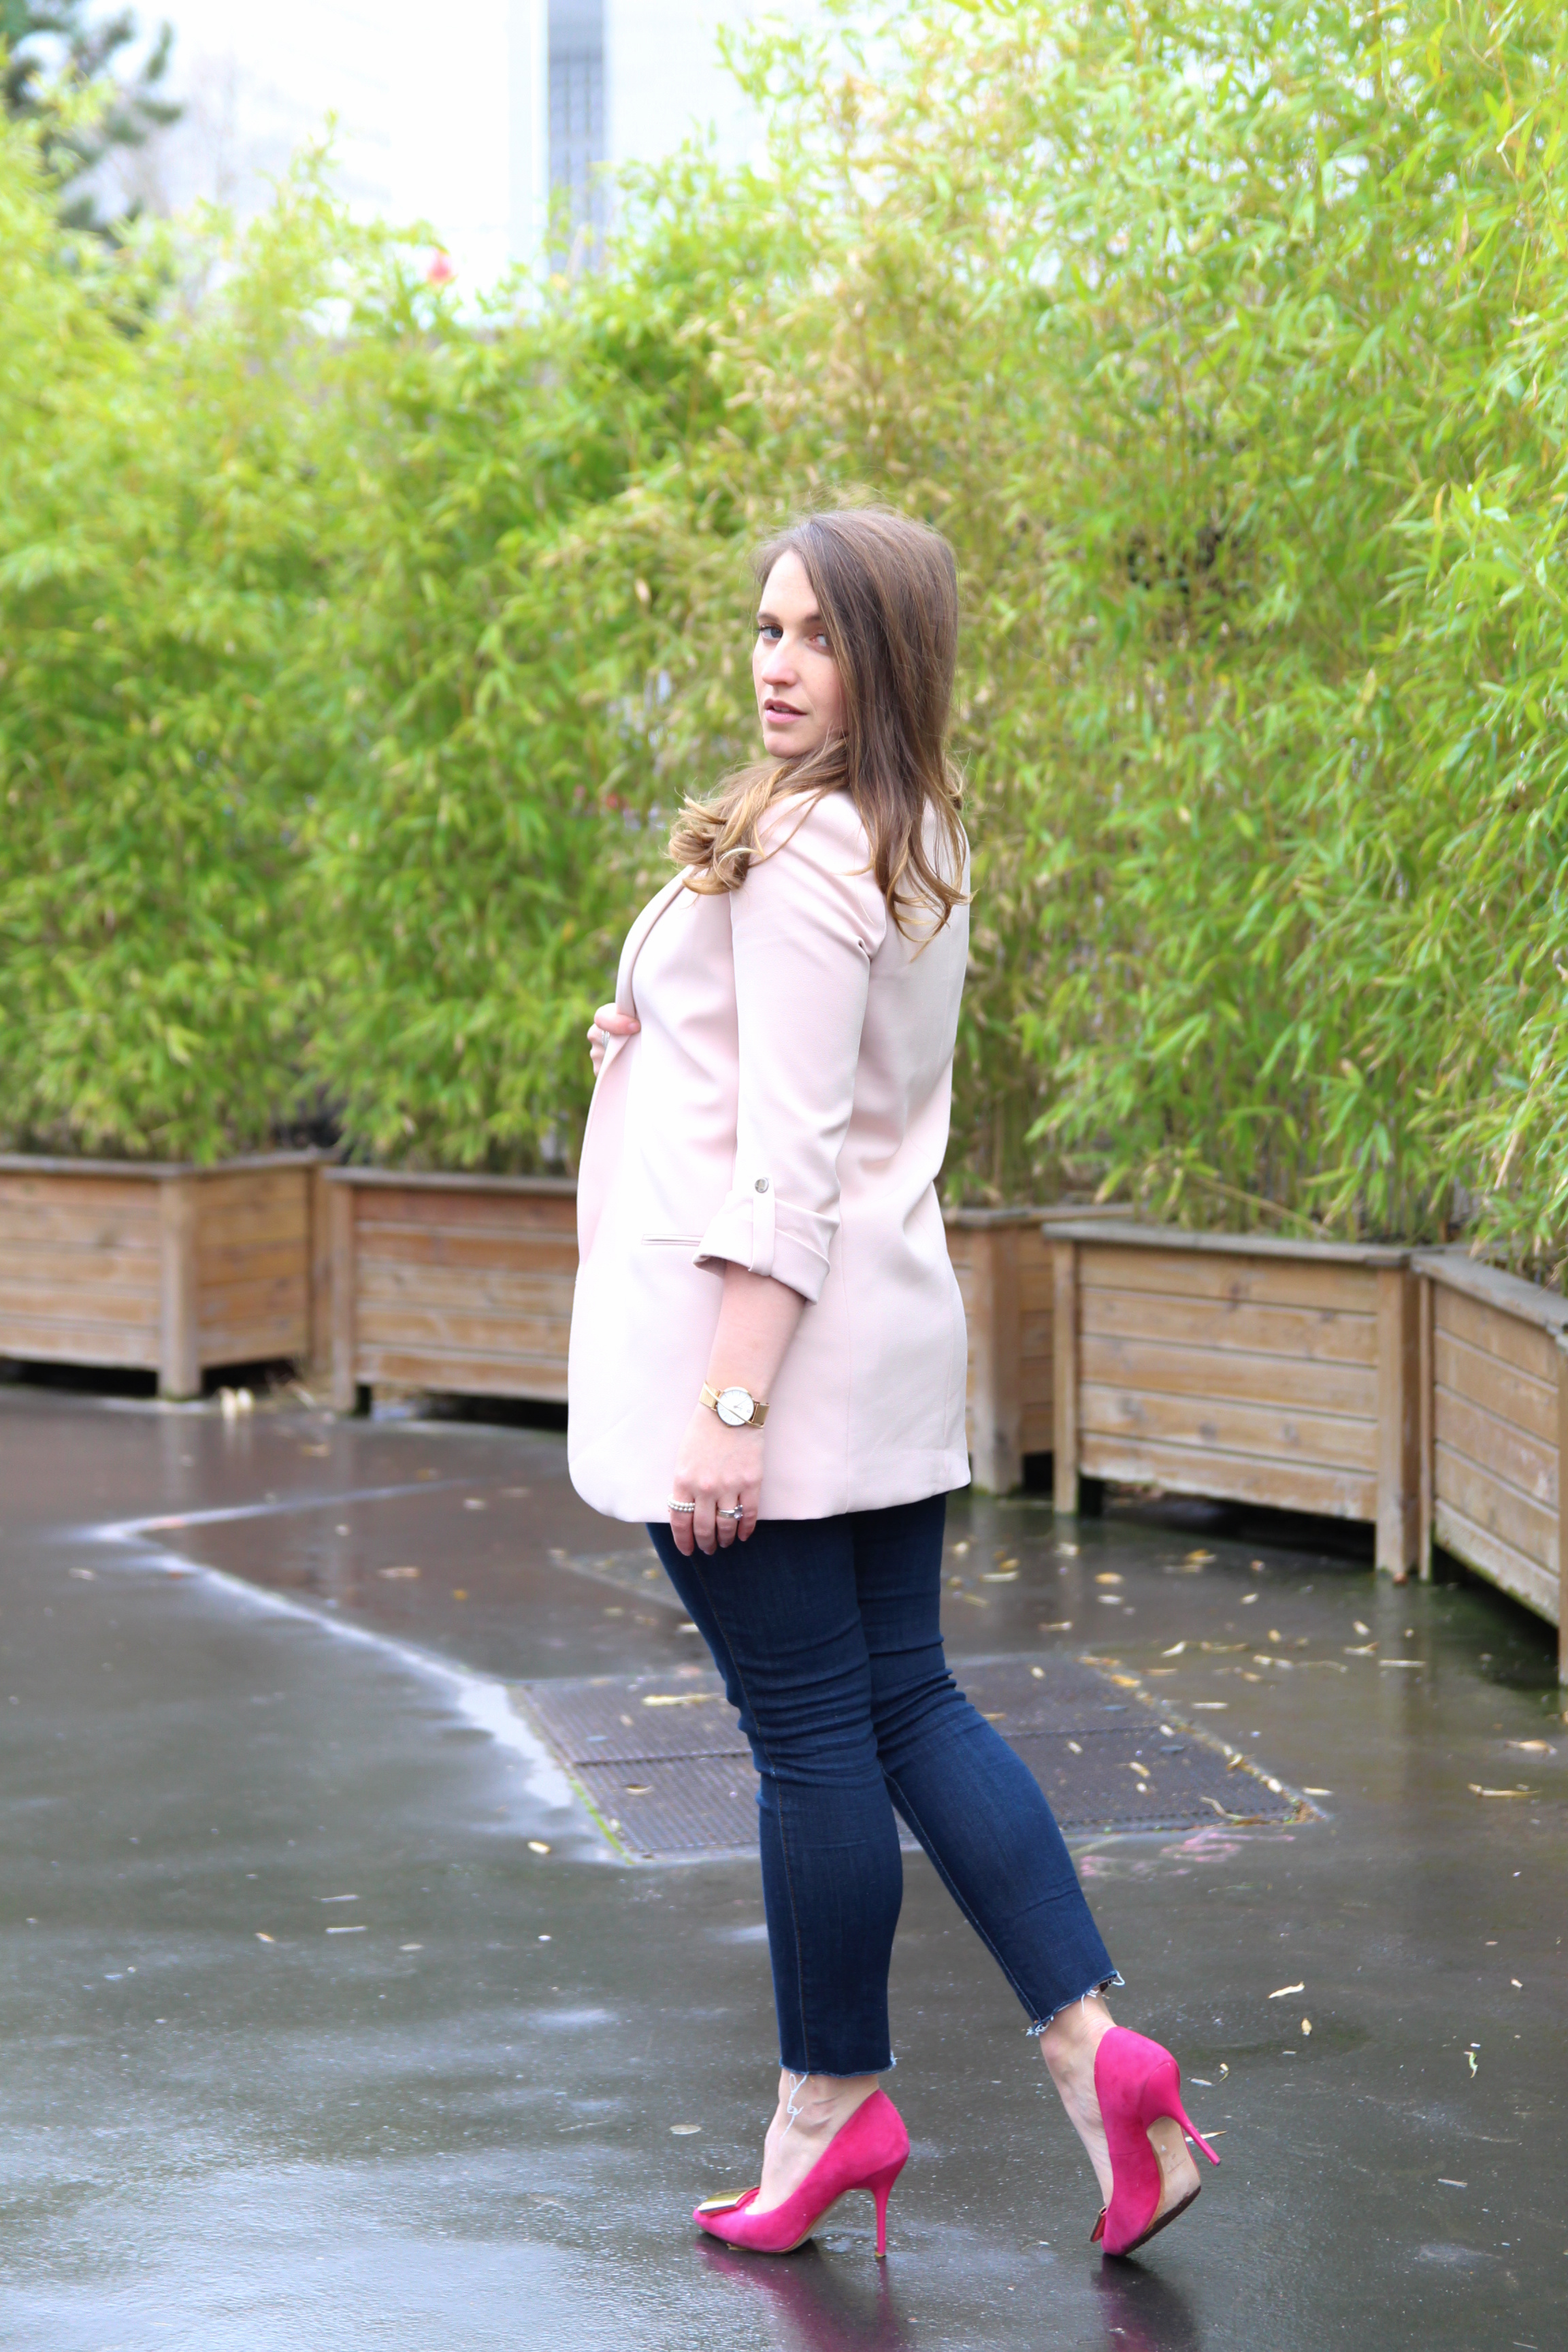 fashionblogger-influencer-jacket-zara-rosepastel-paris-seralynepointcom-2017-03-21 115746